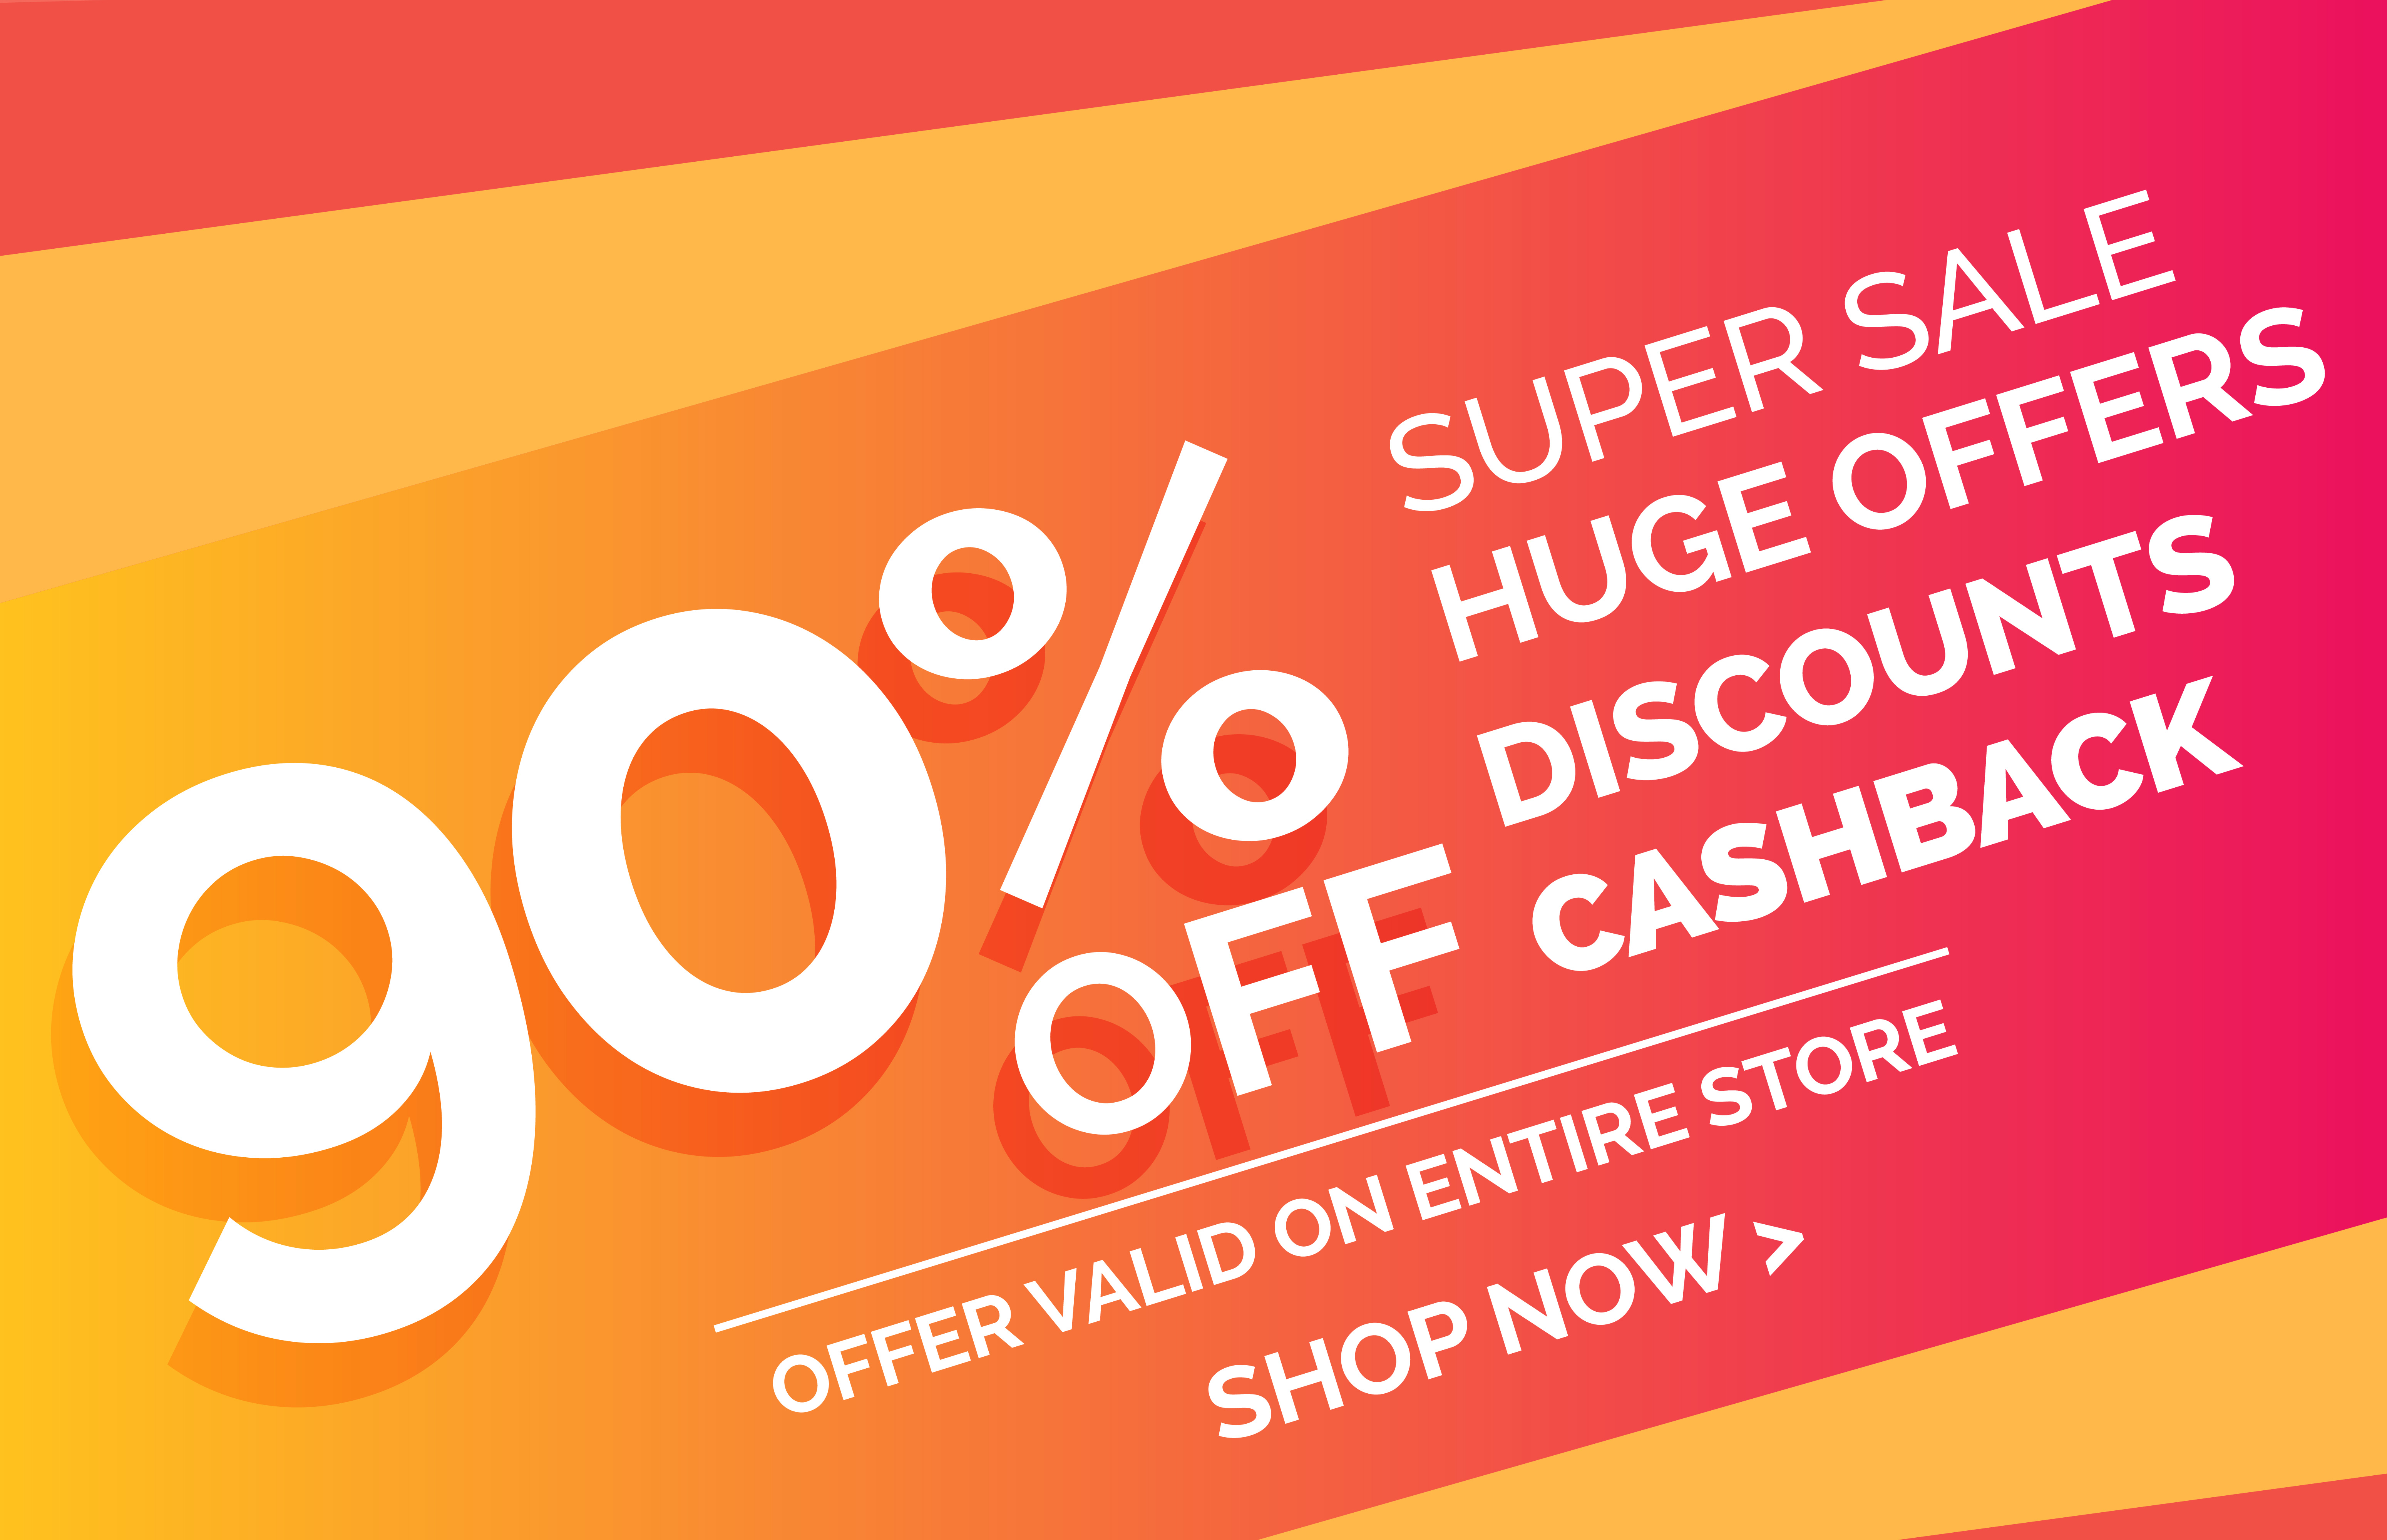 crazy sale offer discount banner voucher template design download free vector art stock